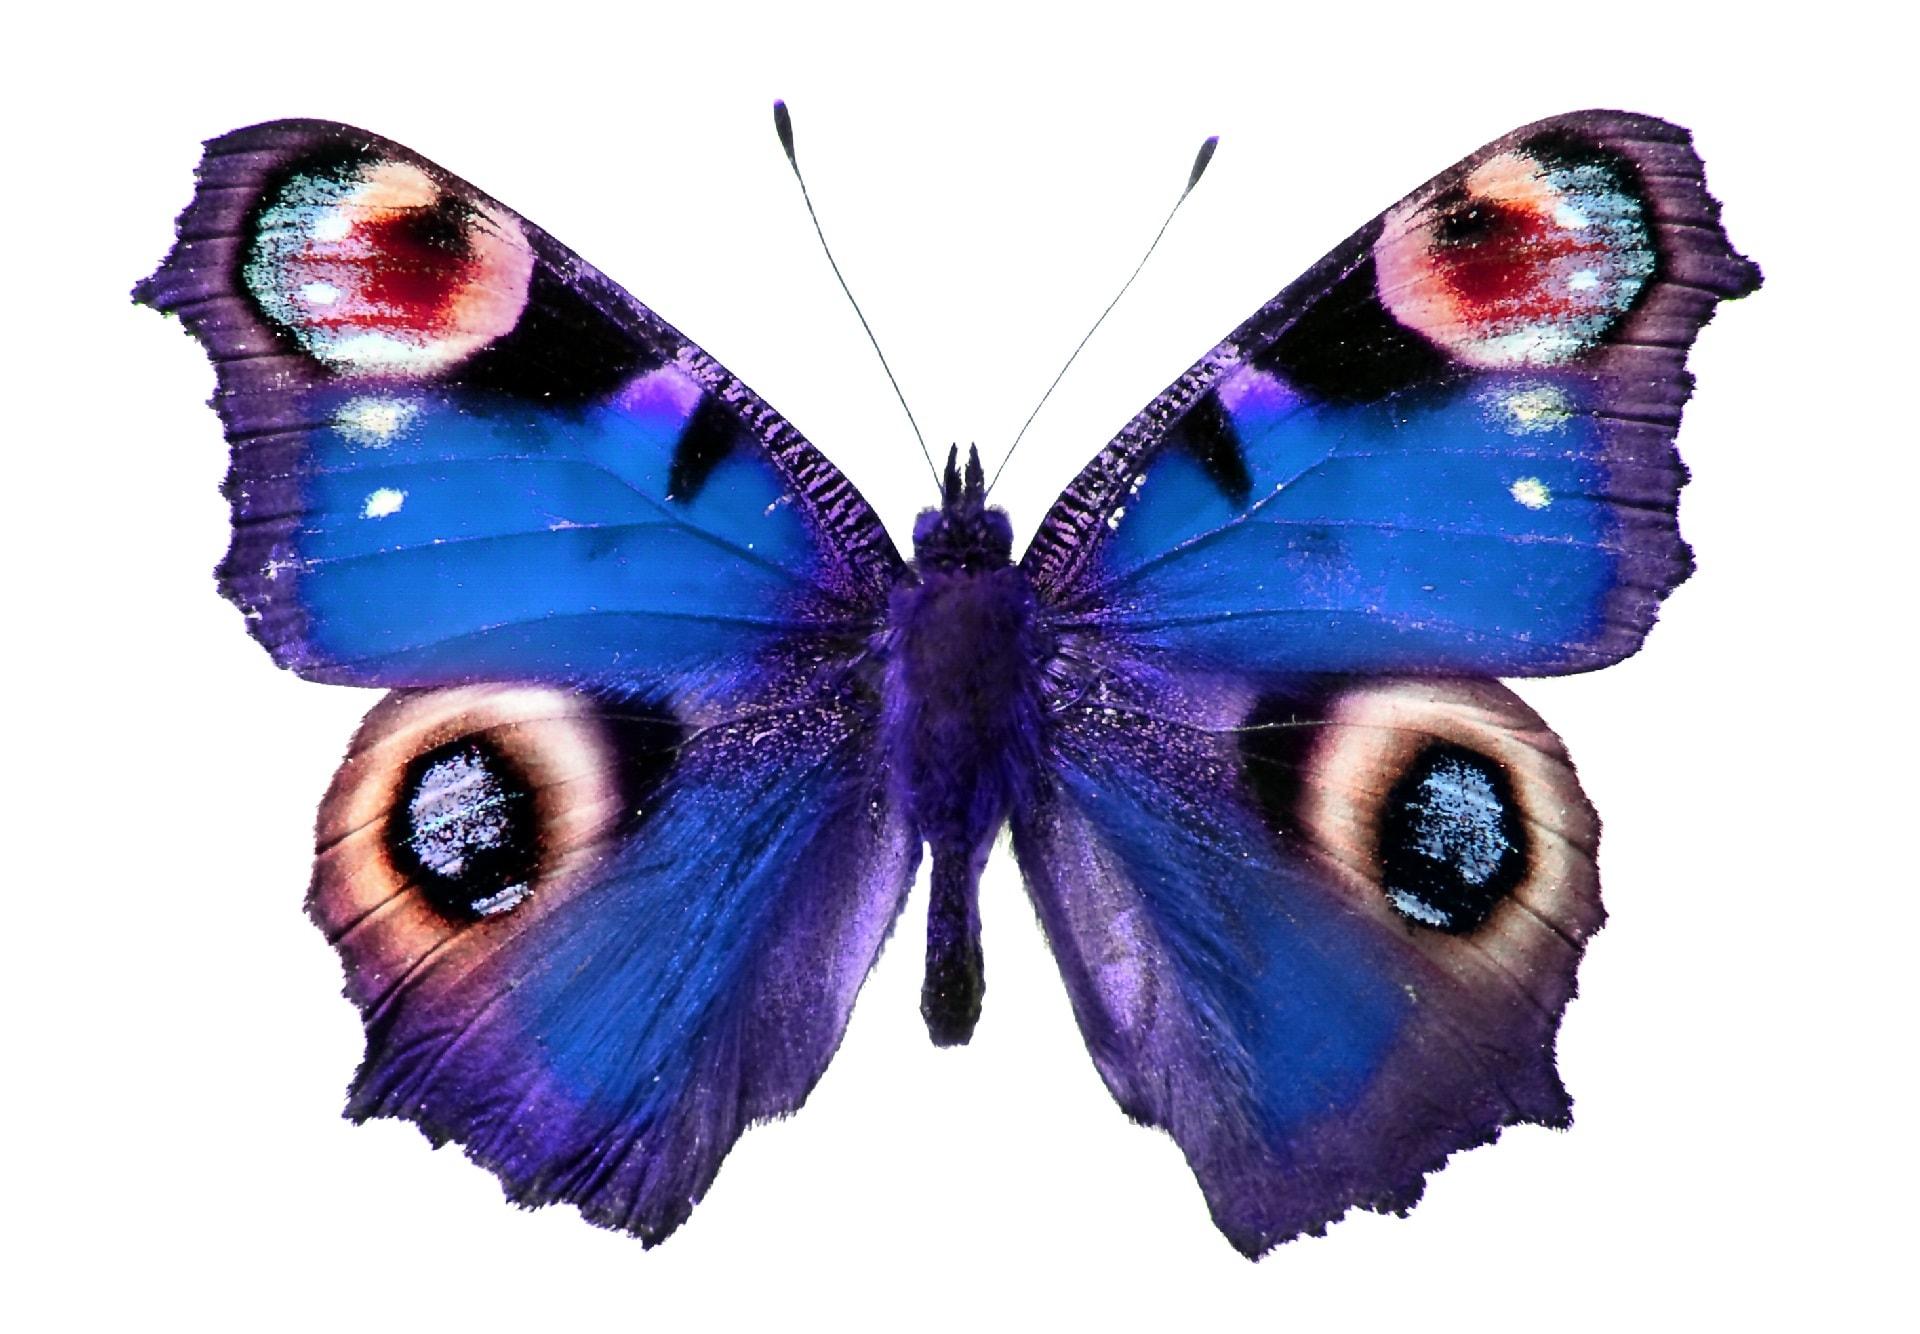 butterfly dream meaning, dream about butterfly, butterfly dream interpretation, seeing in a dream butterfly